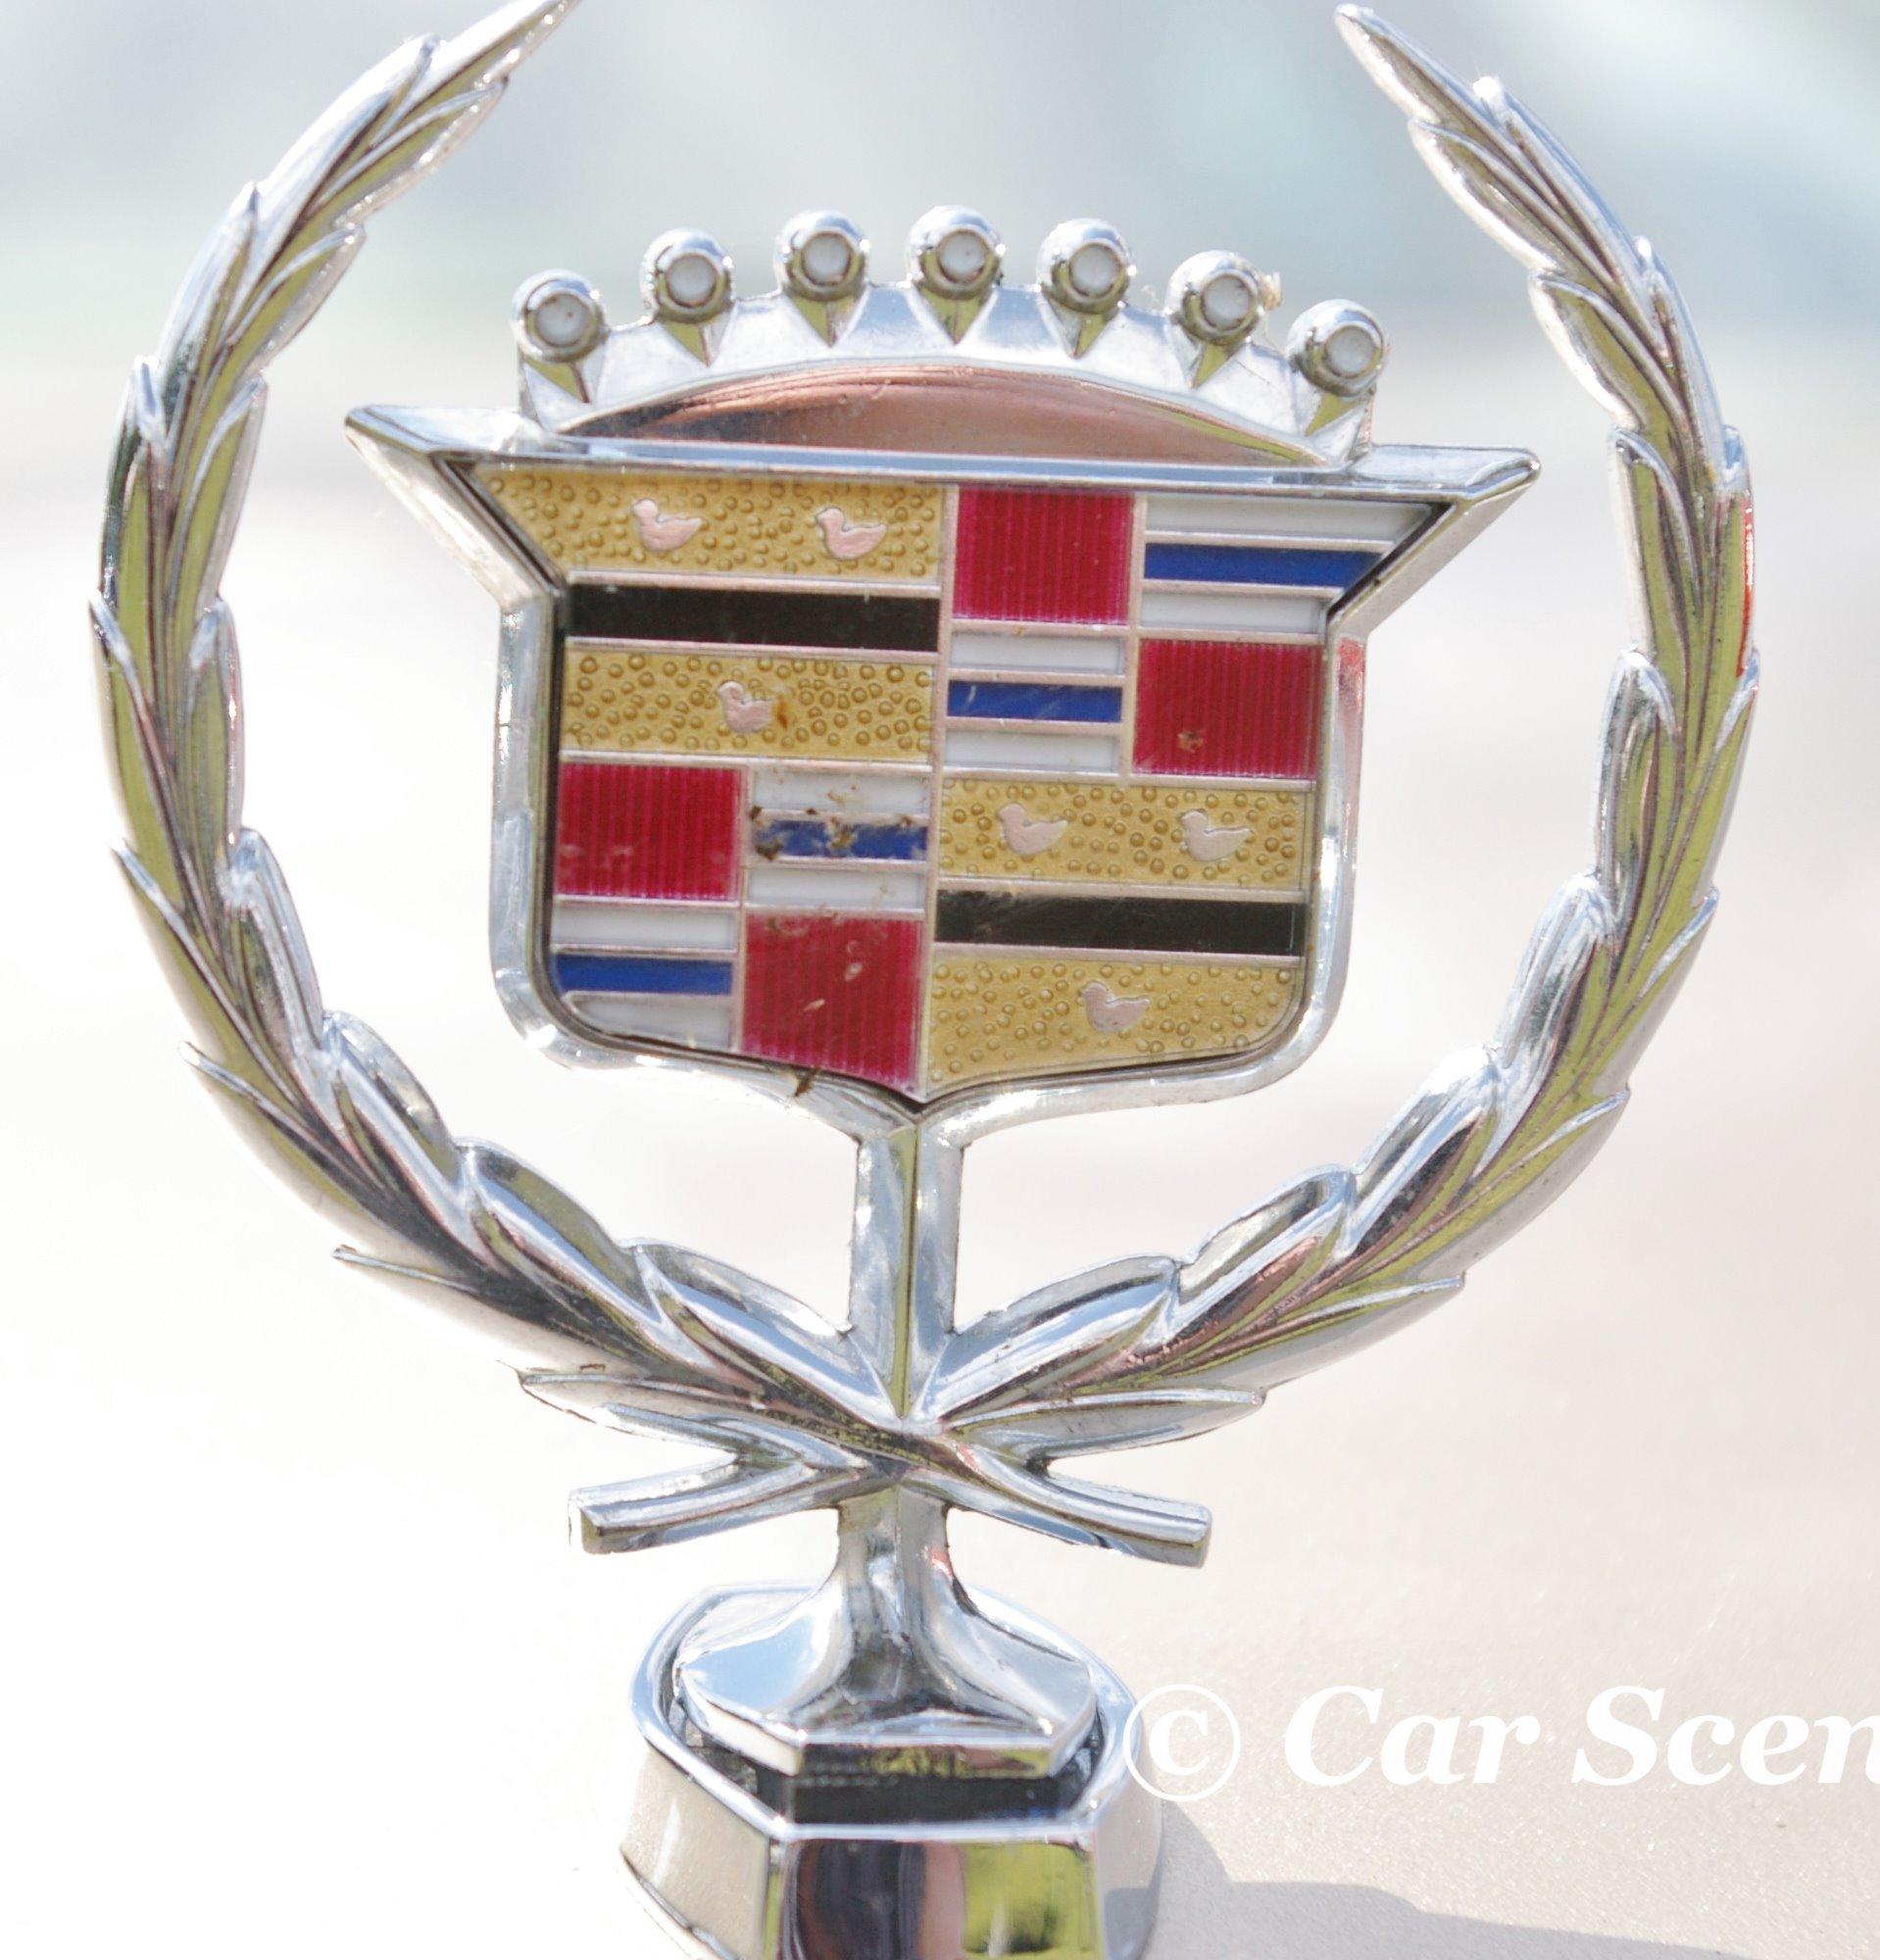 1989 Cadillac DeVille font badge